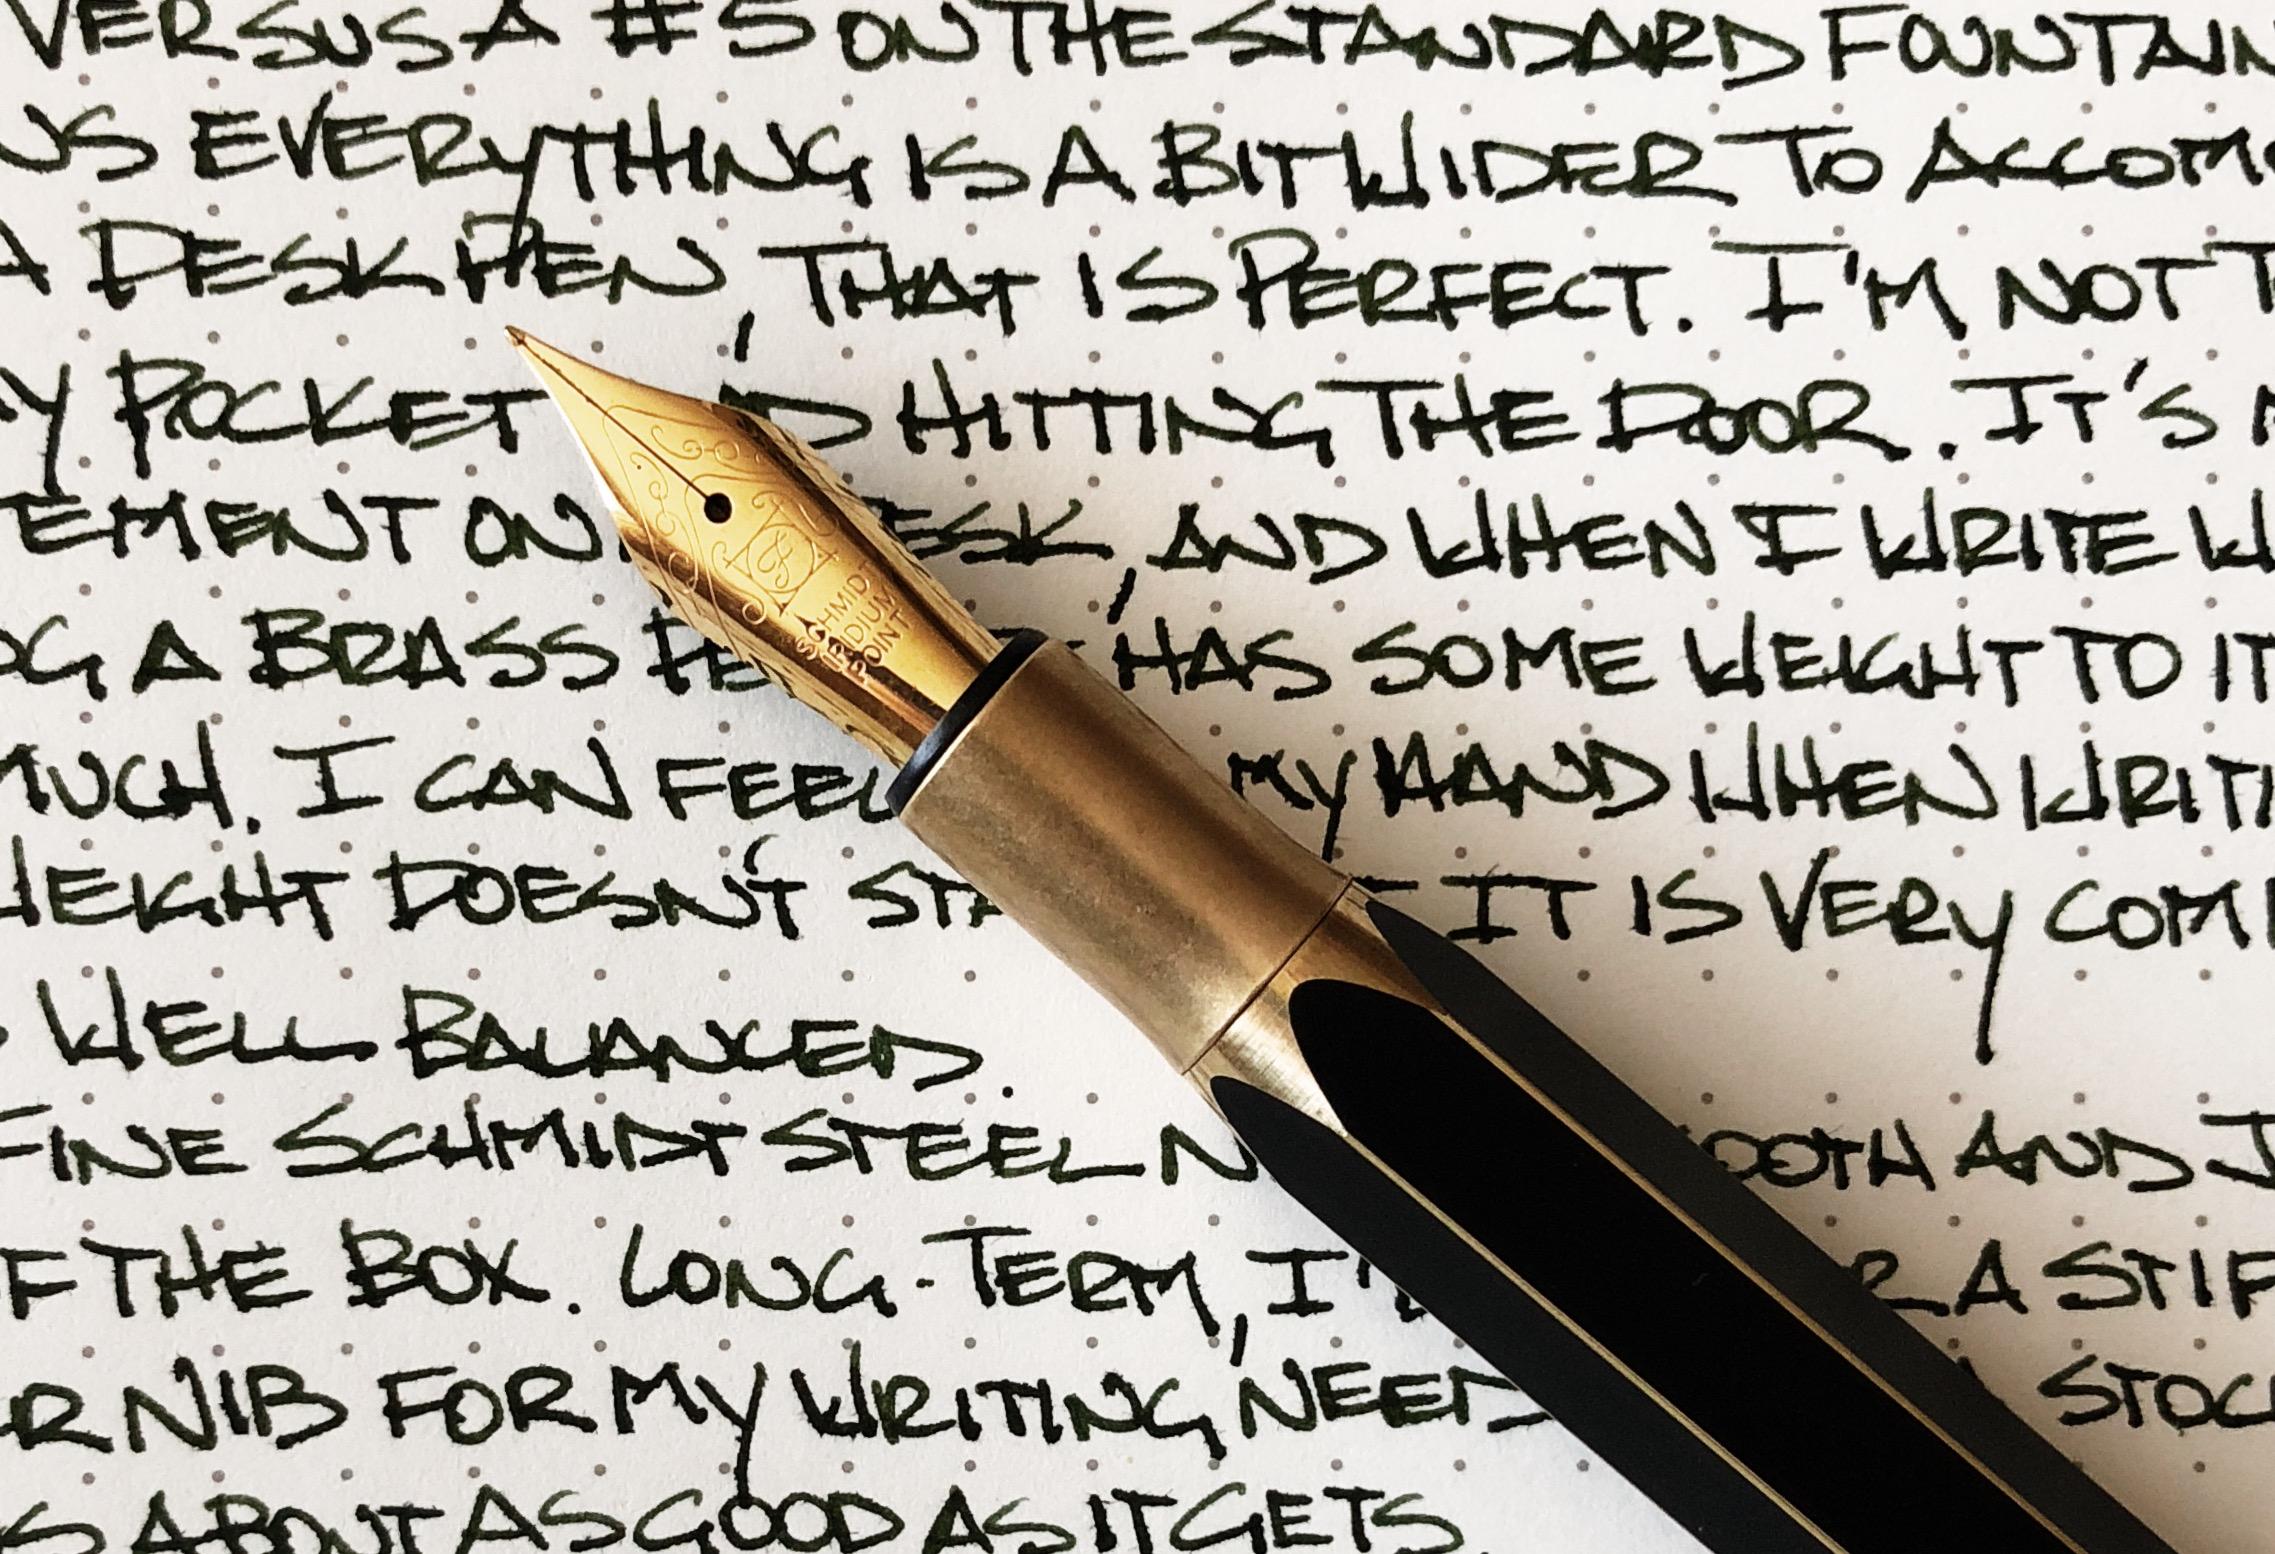 ystudio Brassing Desk Fountain Pen writing